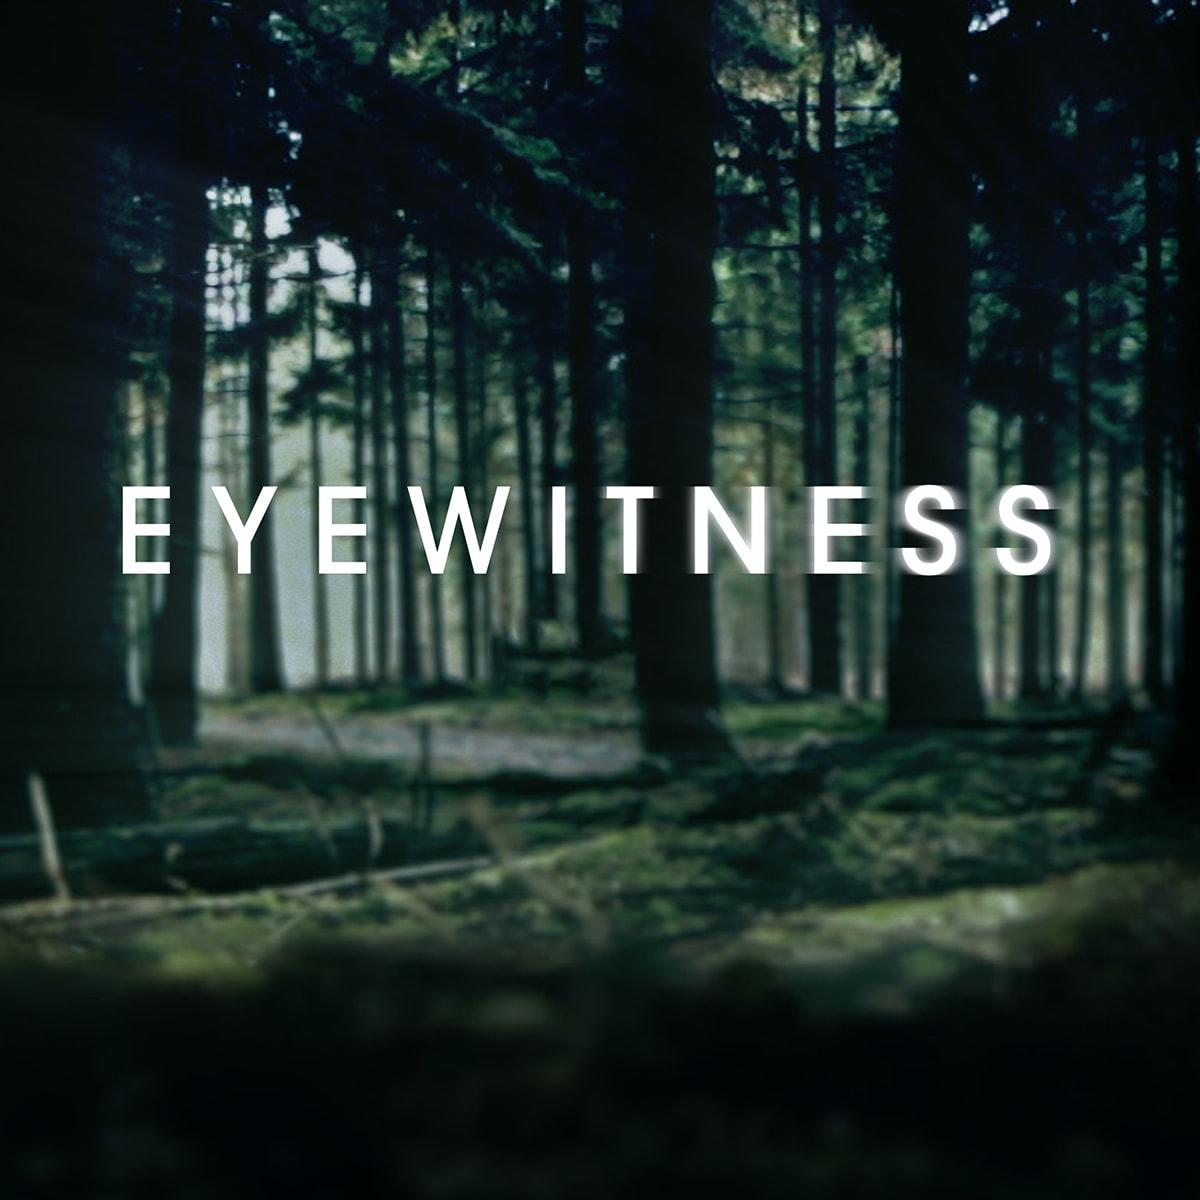 Eyewitness Serie Mediathek